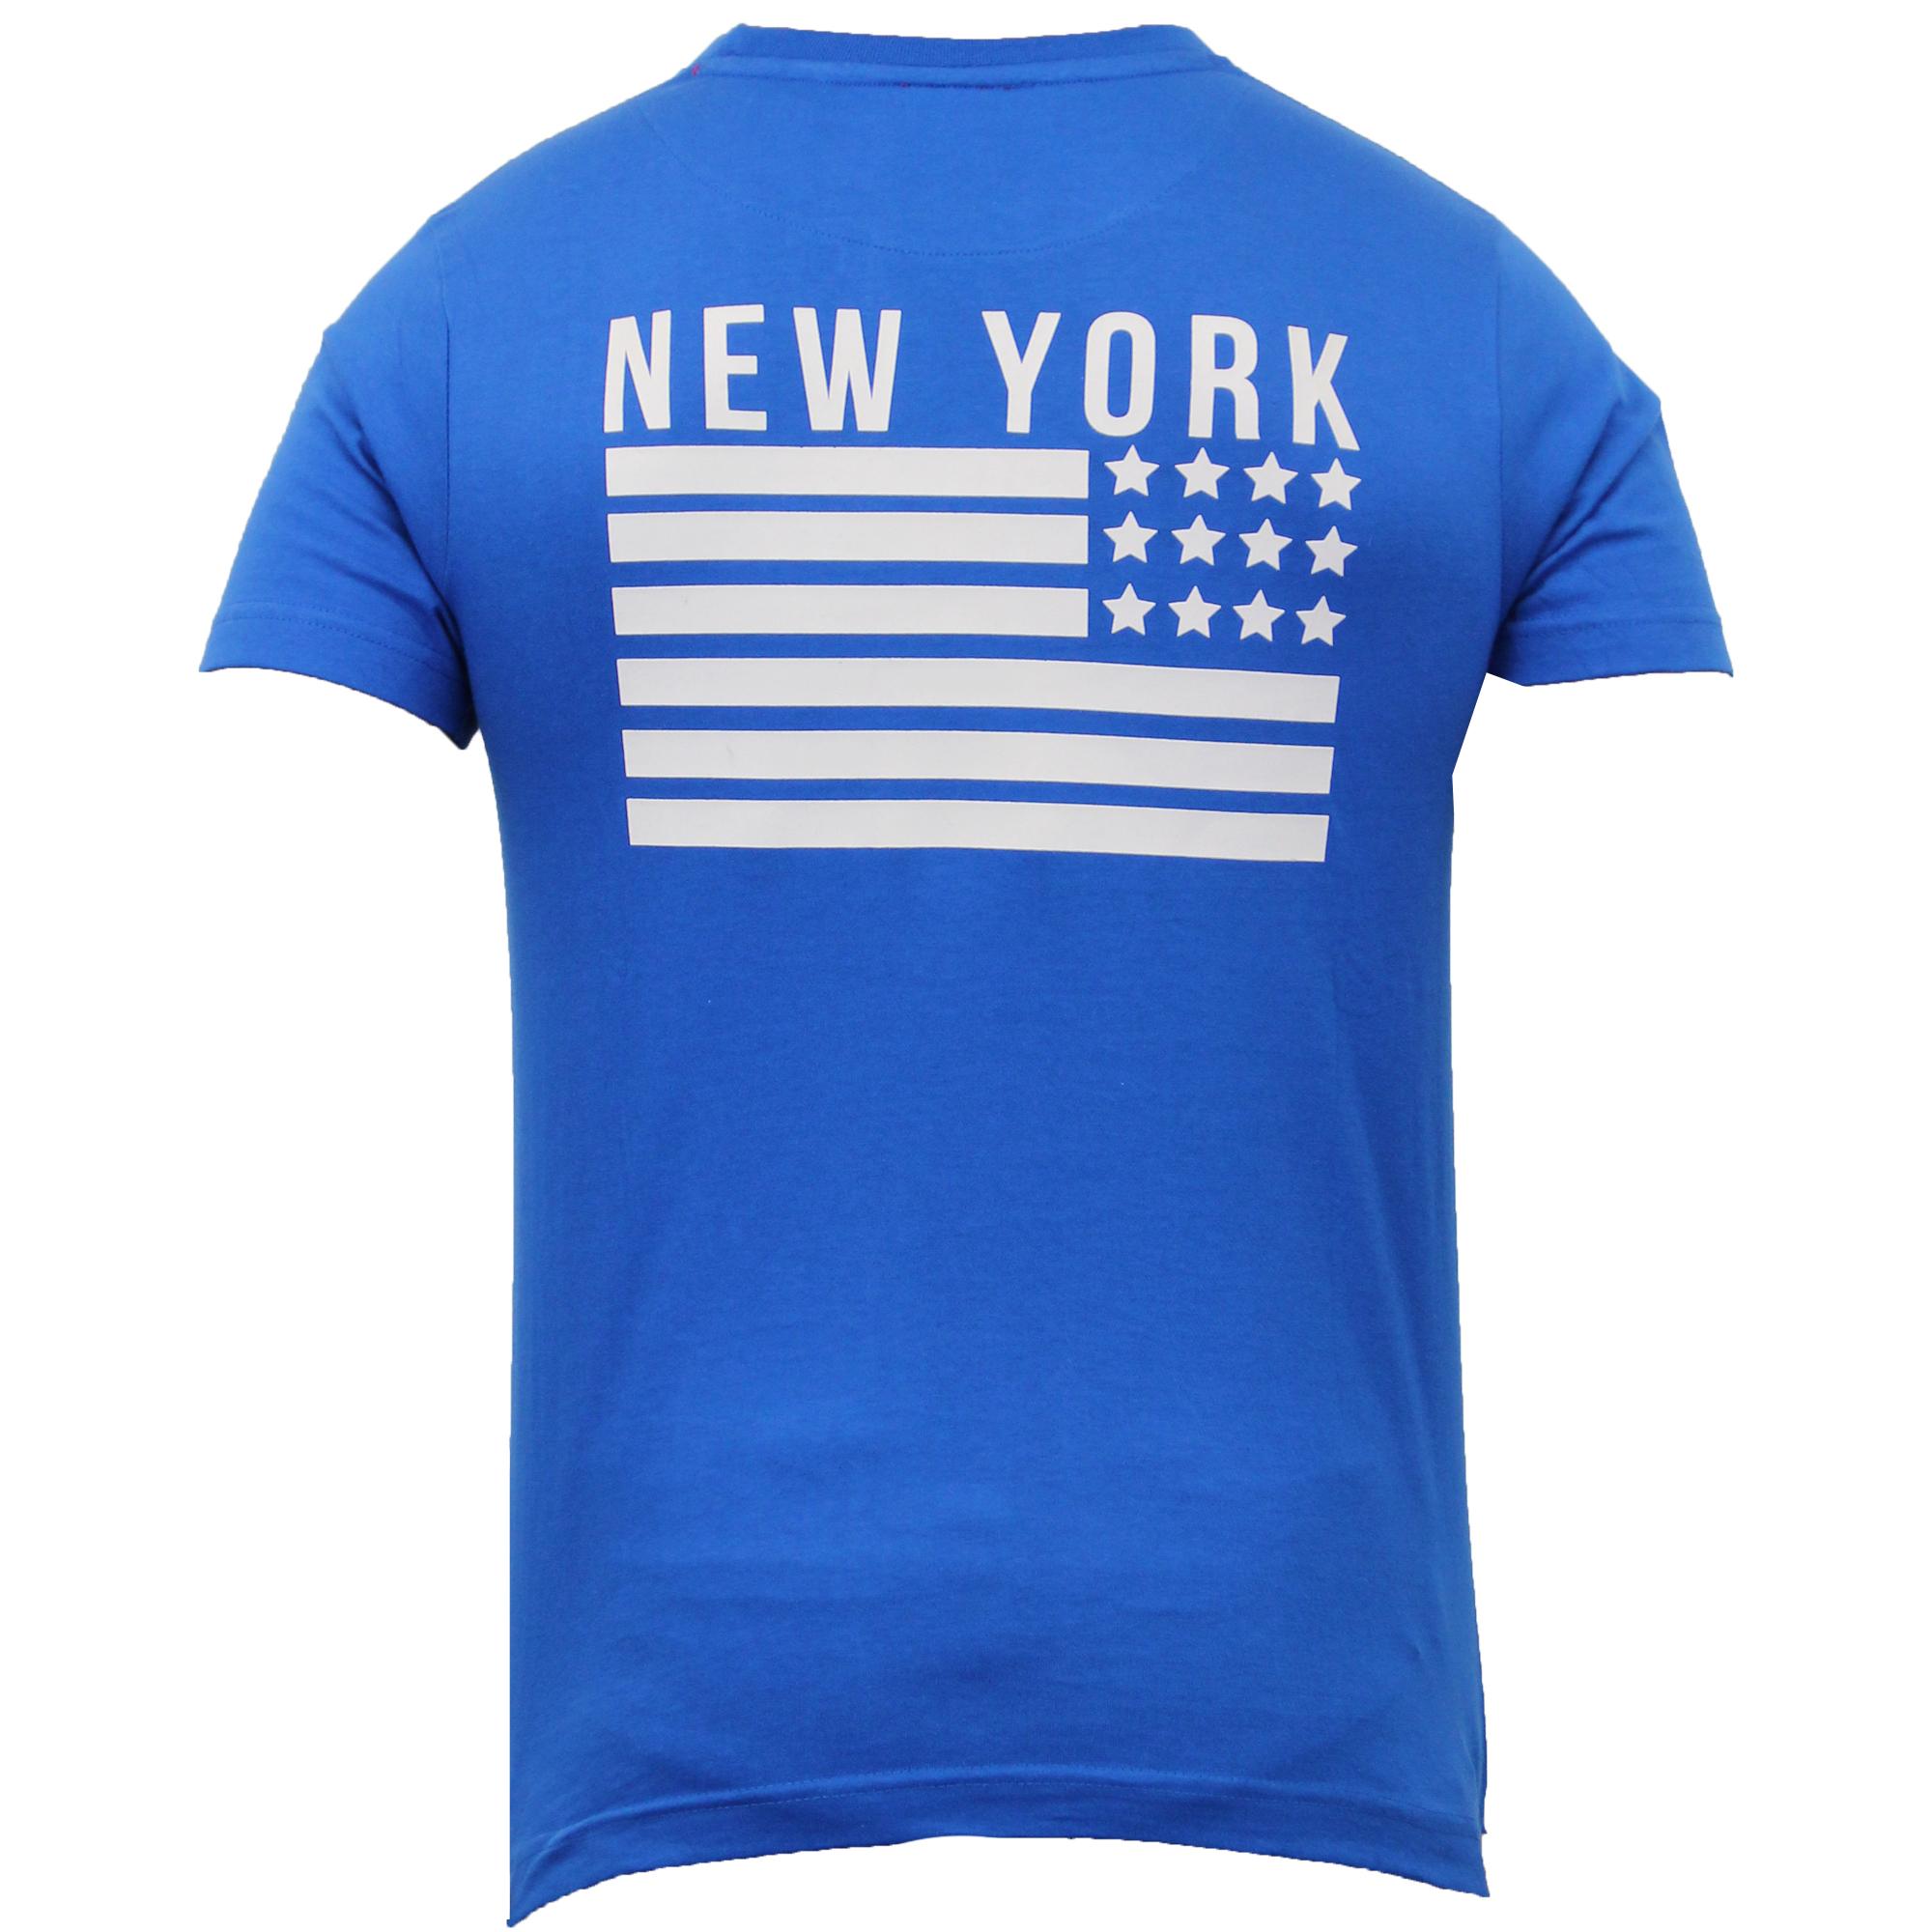 RAGAZZI T Shirt Joe Bloggs Kids a maniche corte Top Mesh BROOKLYN NYC Casual Estate